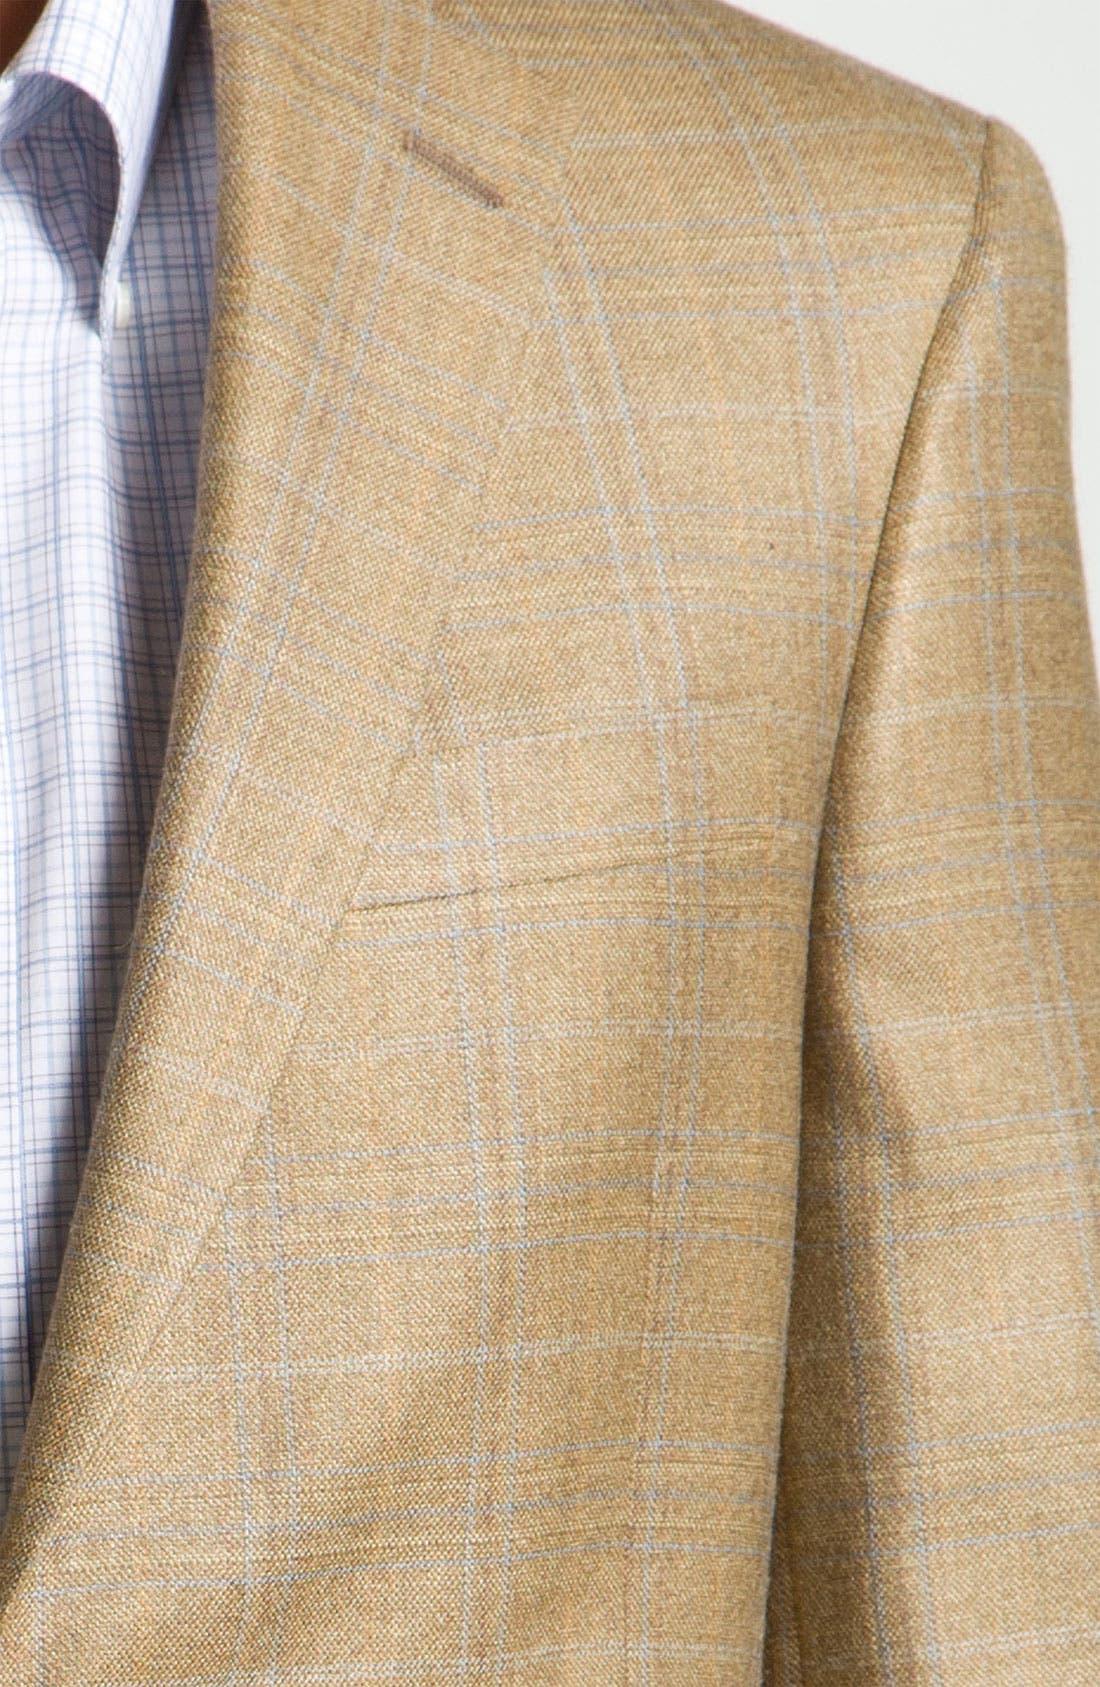 Alternate Image 3  - Hart Schaffner Marx Brown Plaid Wool Sportcoat